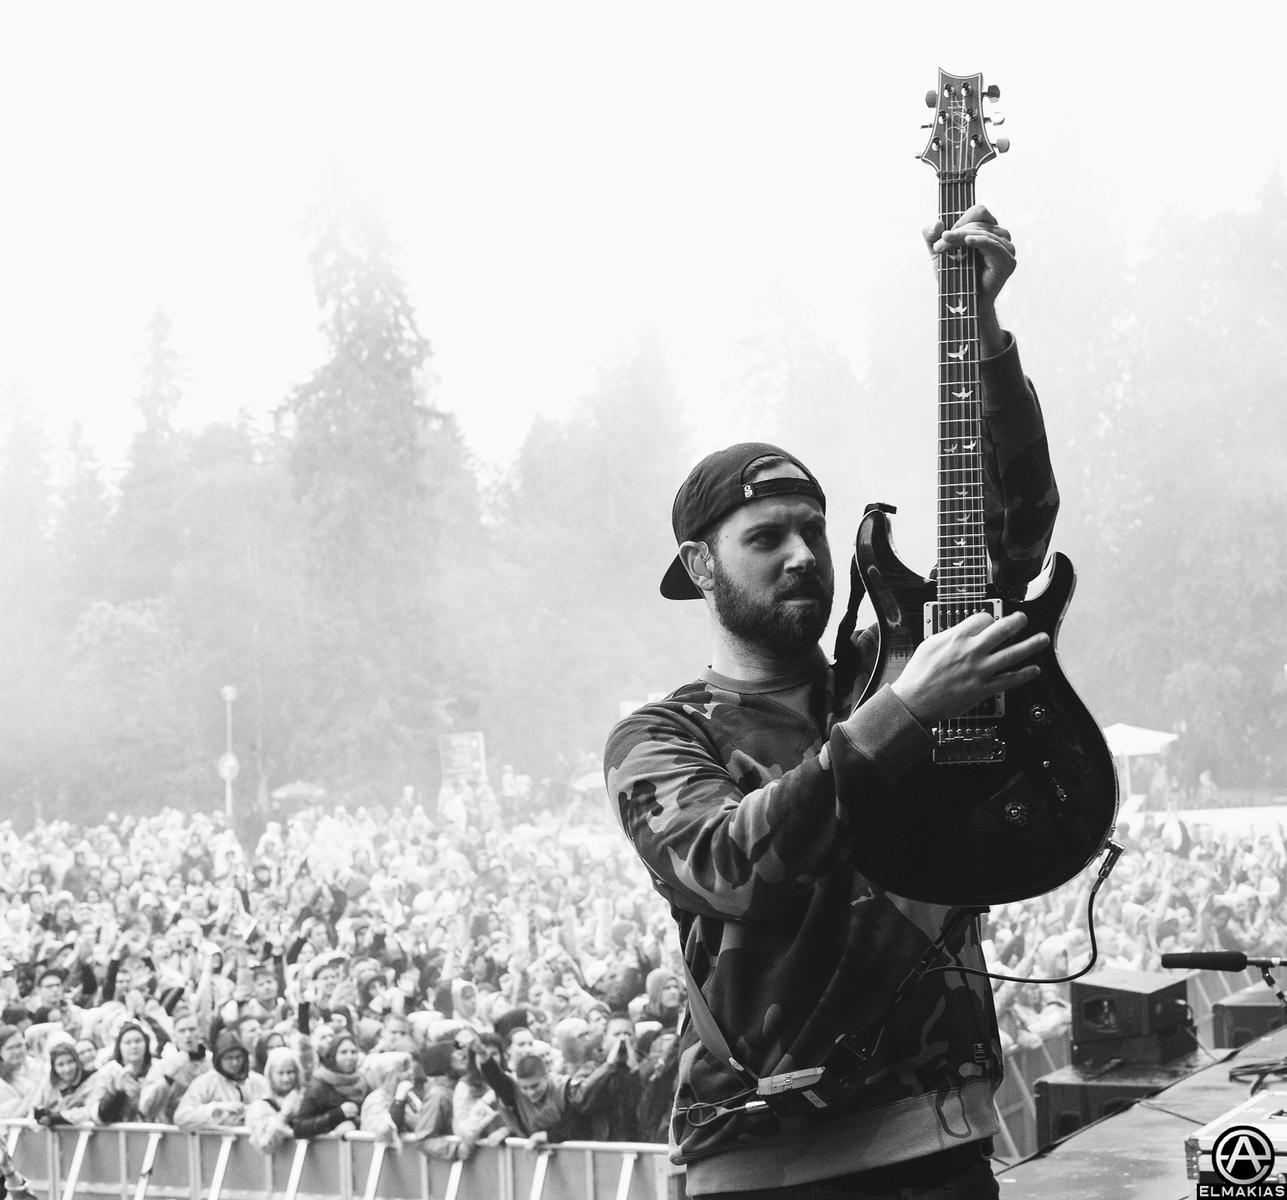 Kevin Skaff of A Day To Remember at Provinssirock in Helsinki, Finland - European Festivals